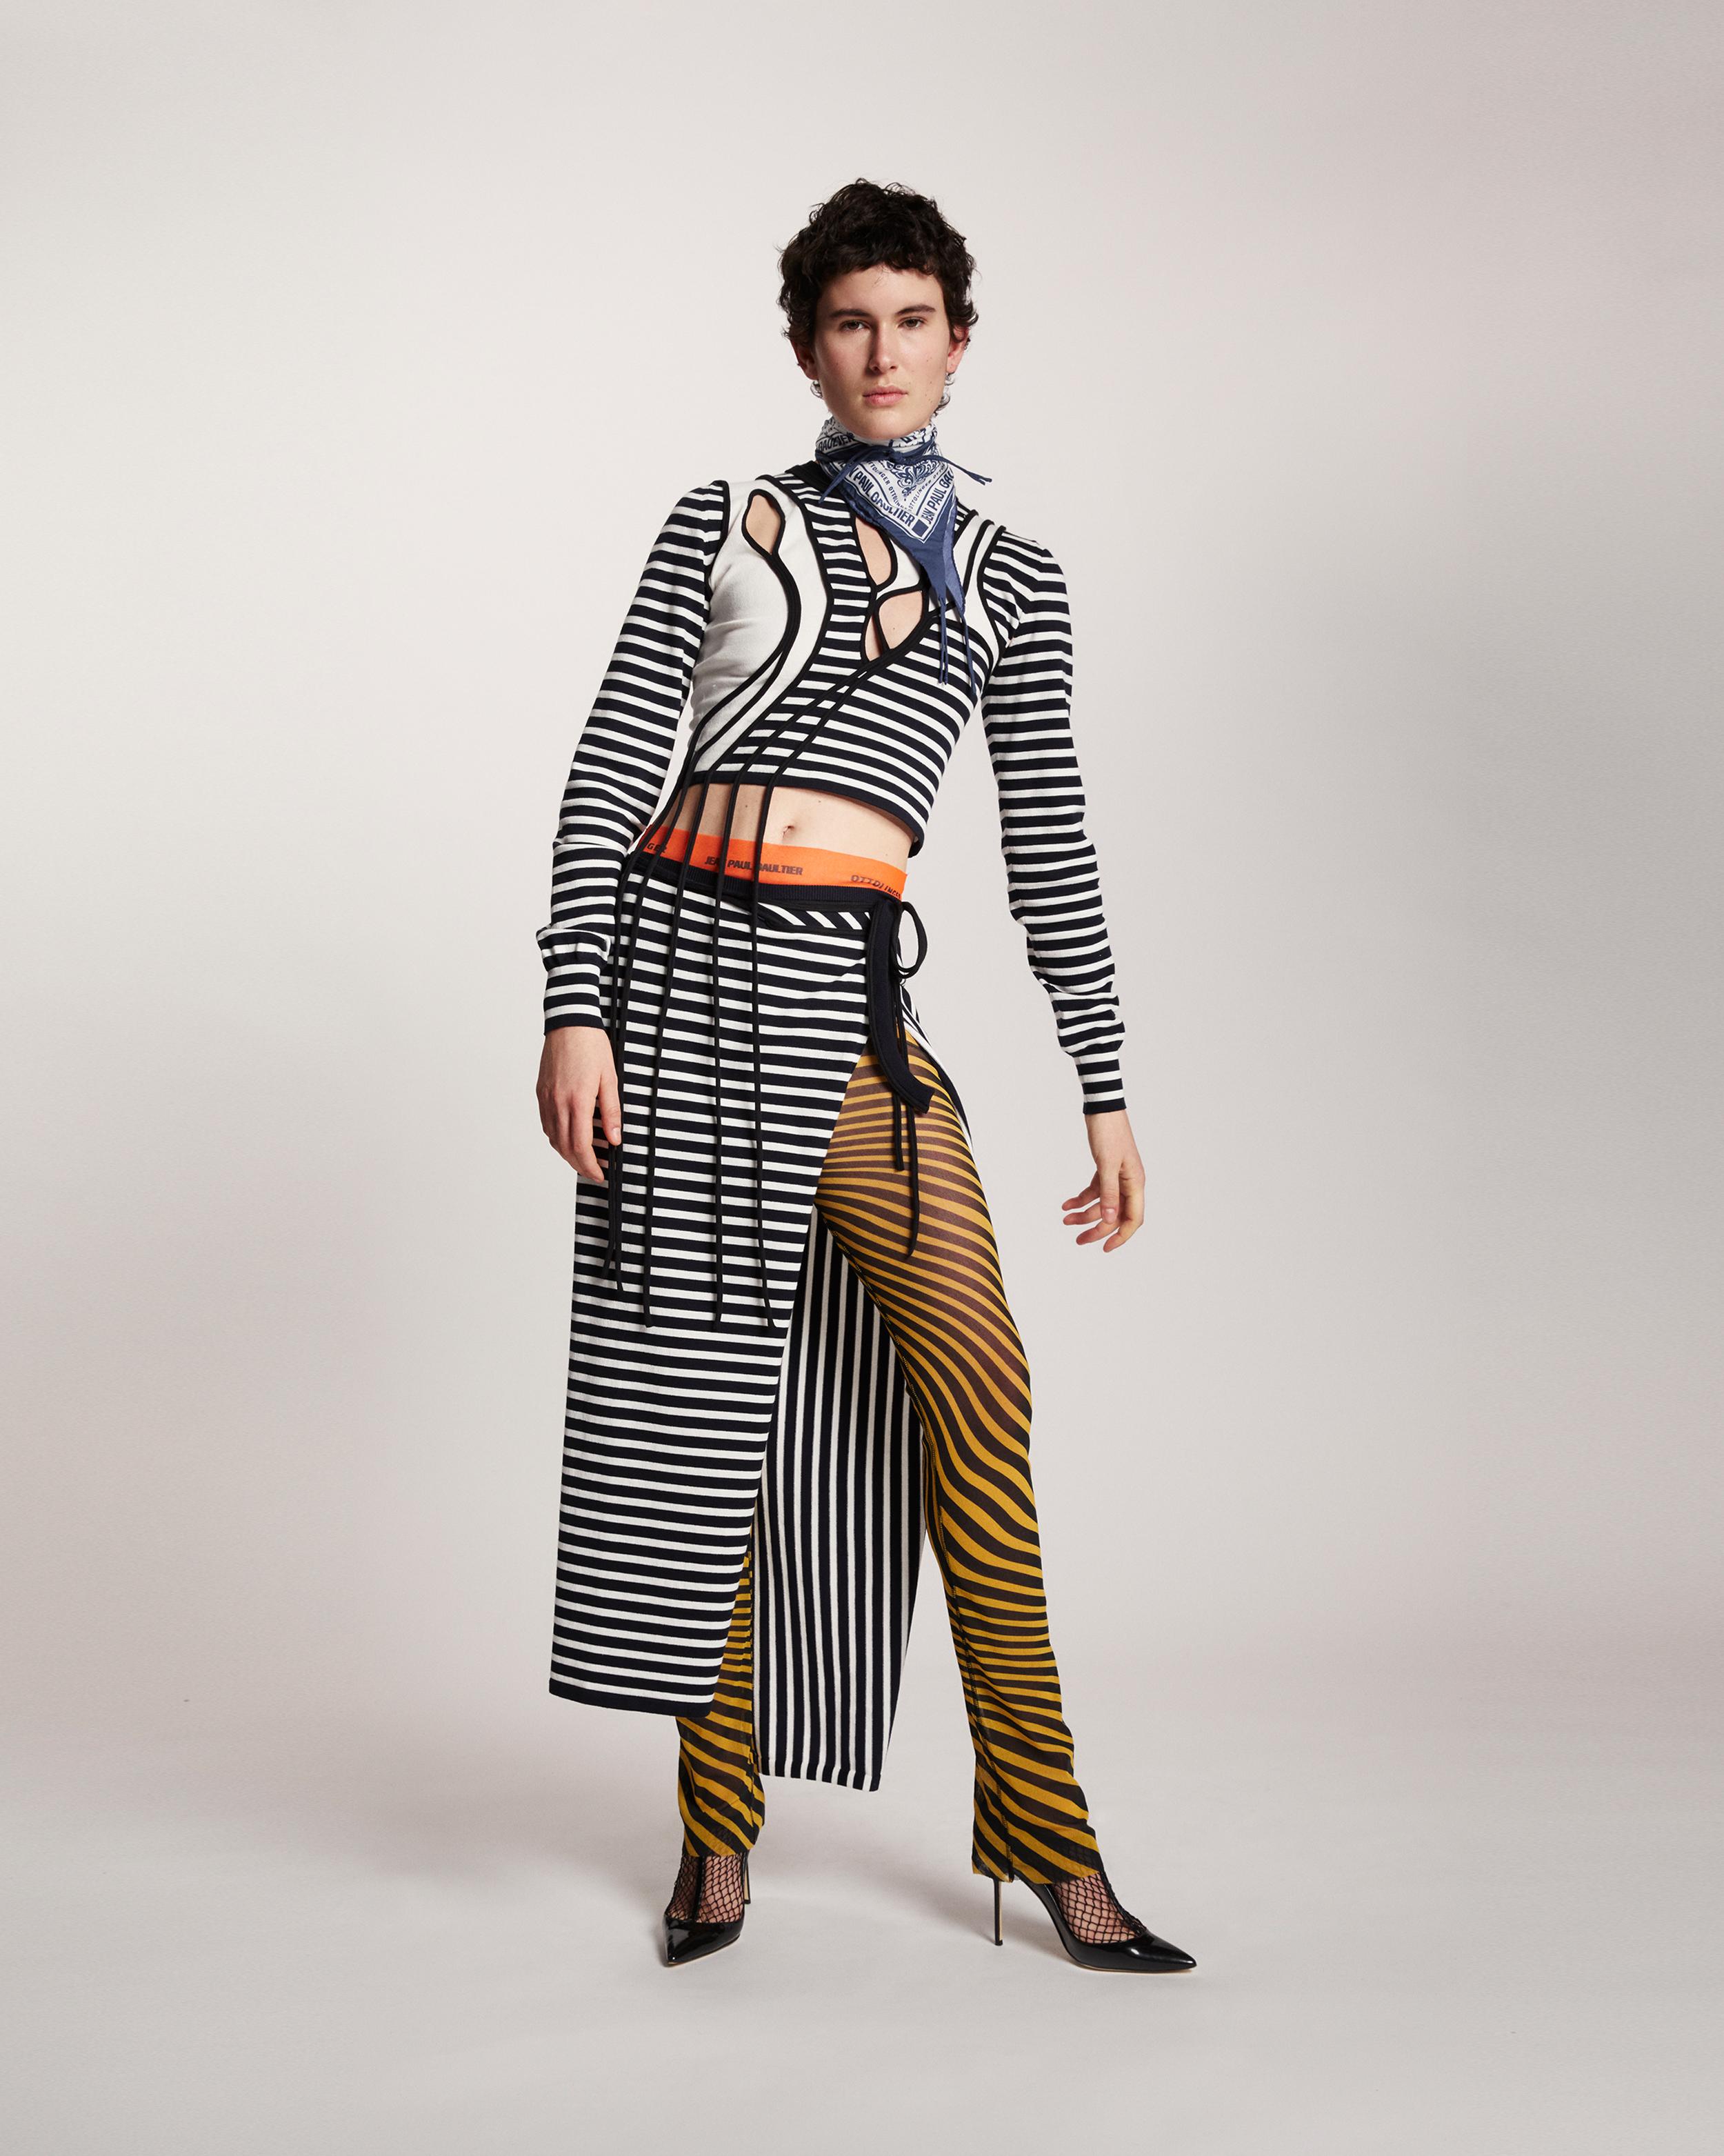 A model wearing a Ottolinger x Jean Paul Gaultier collab look